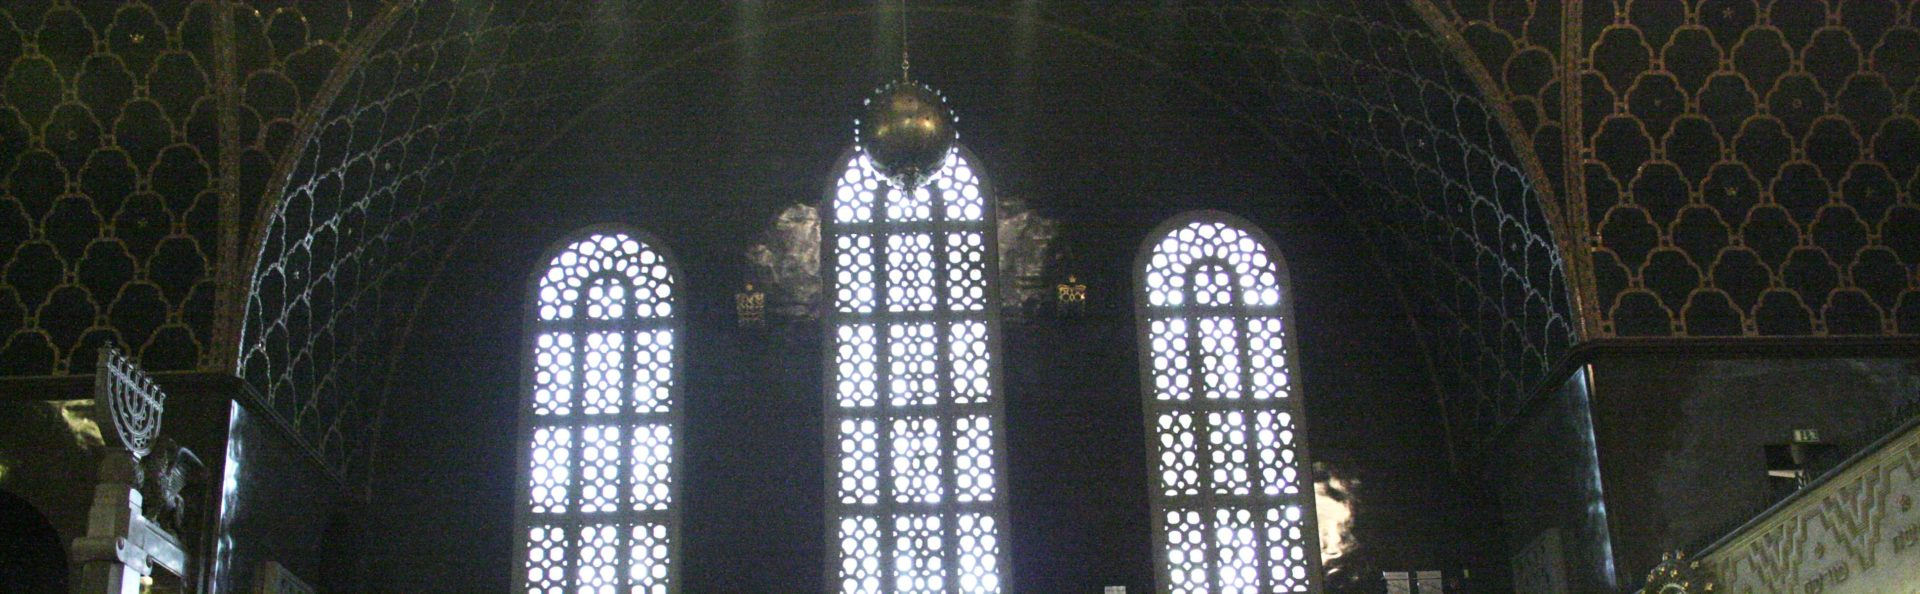 100 Jahre Augsburger Synagoge